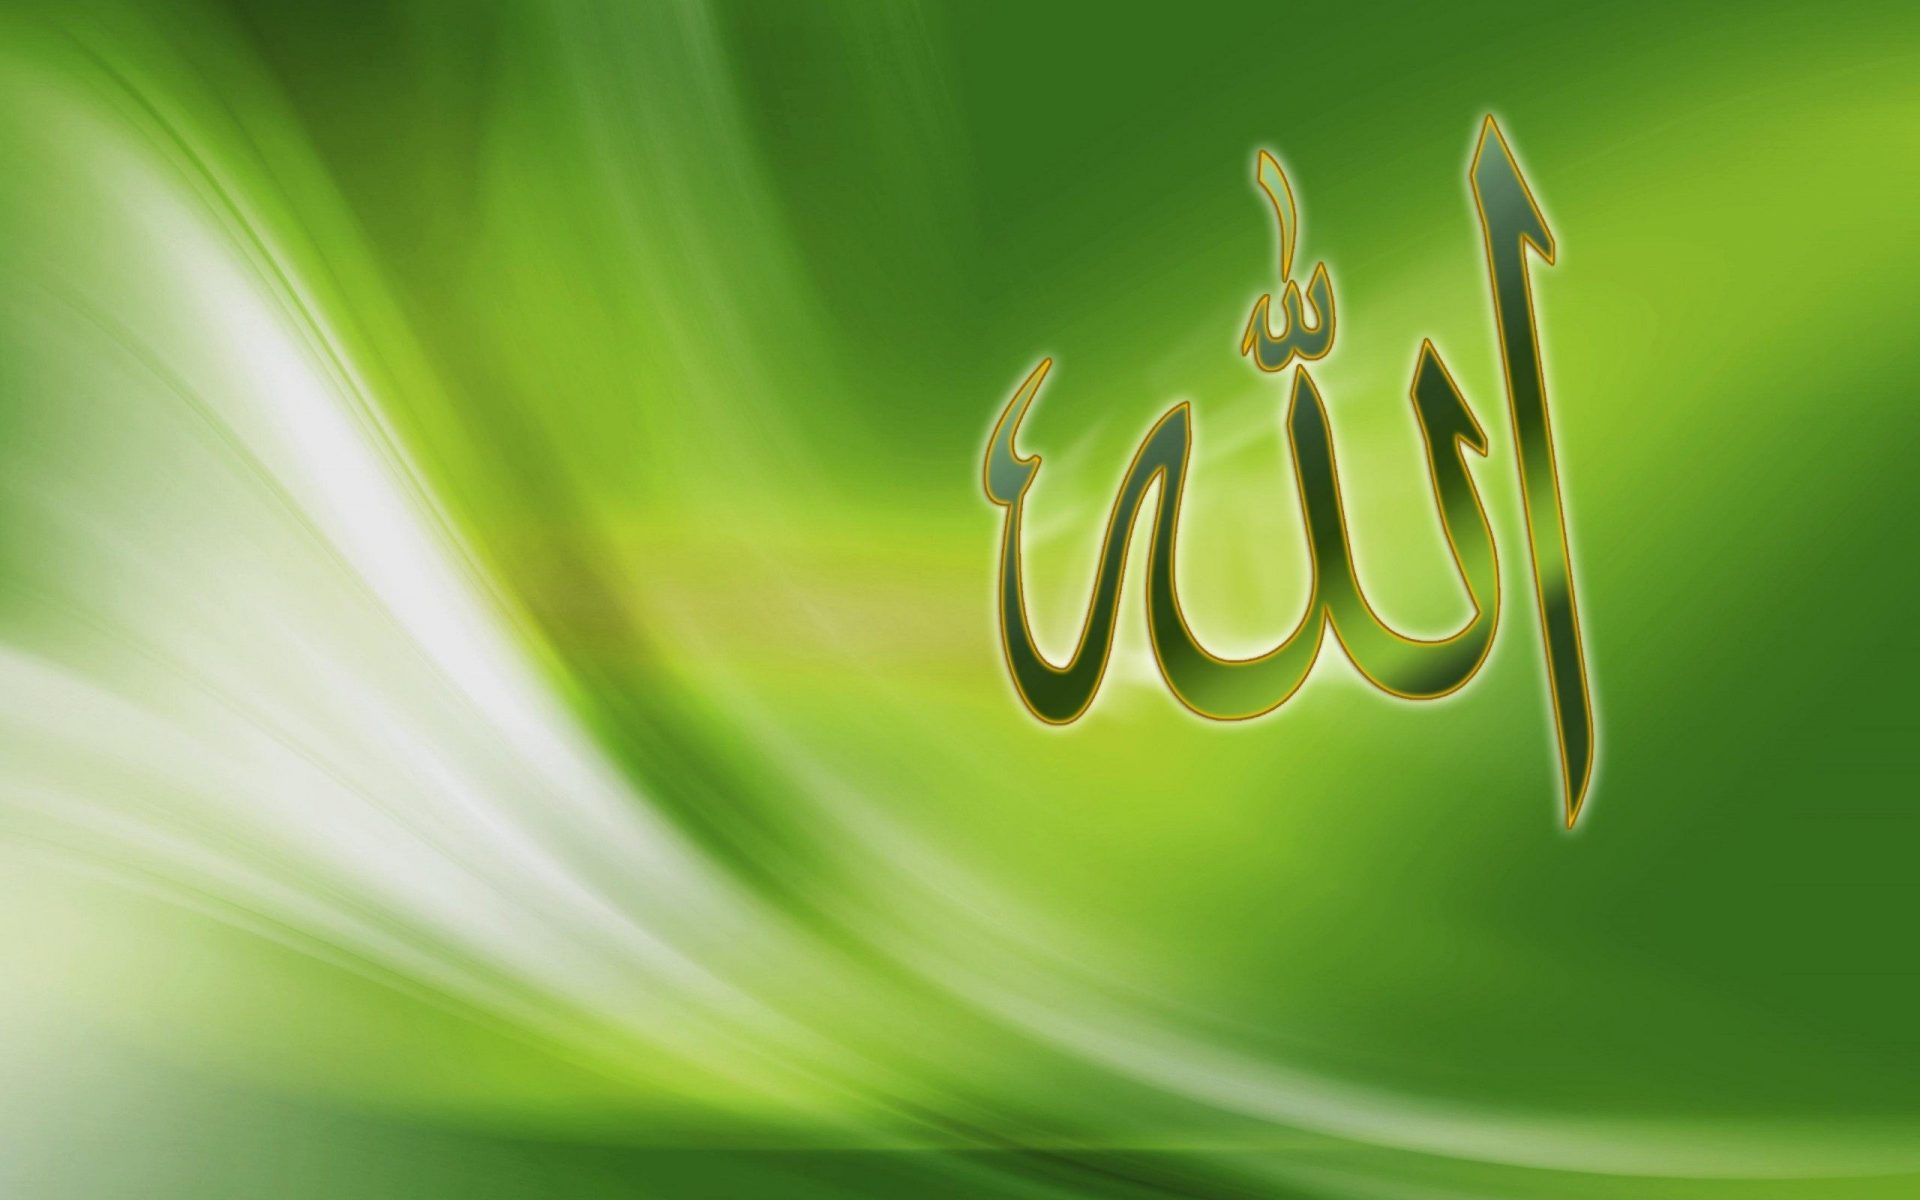 Wallpaper download on mobile - Full Hd Allah Name Wallpaper Desktop Wallpaper Download Free For Widescreen Mobile Table